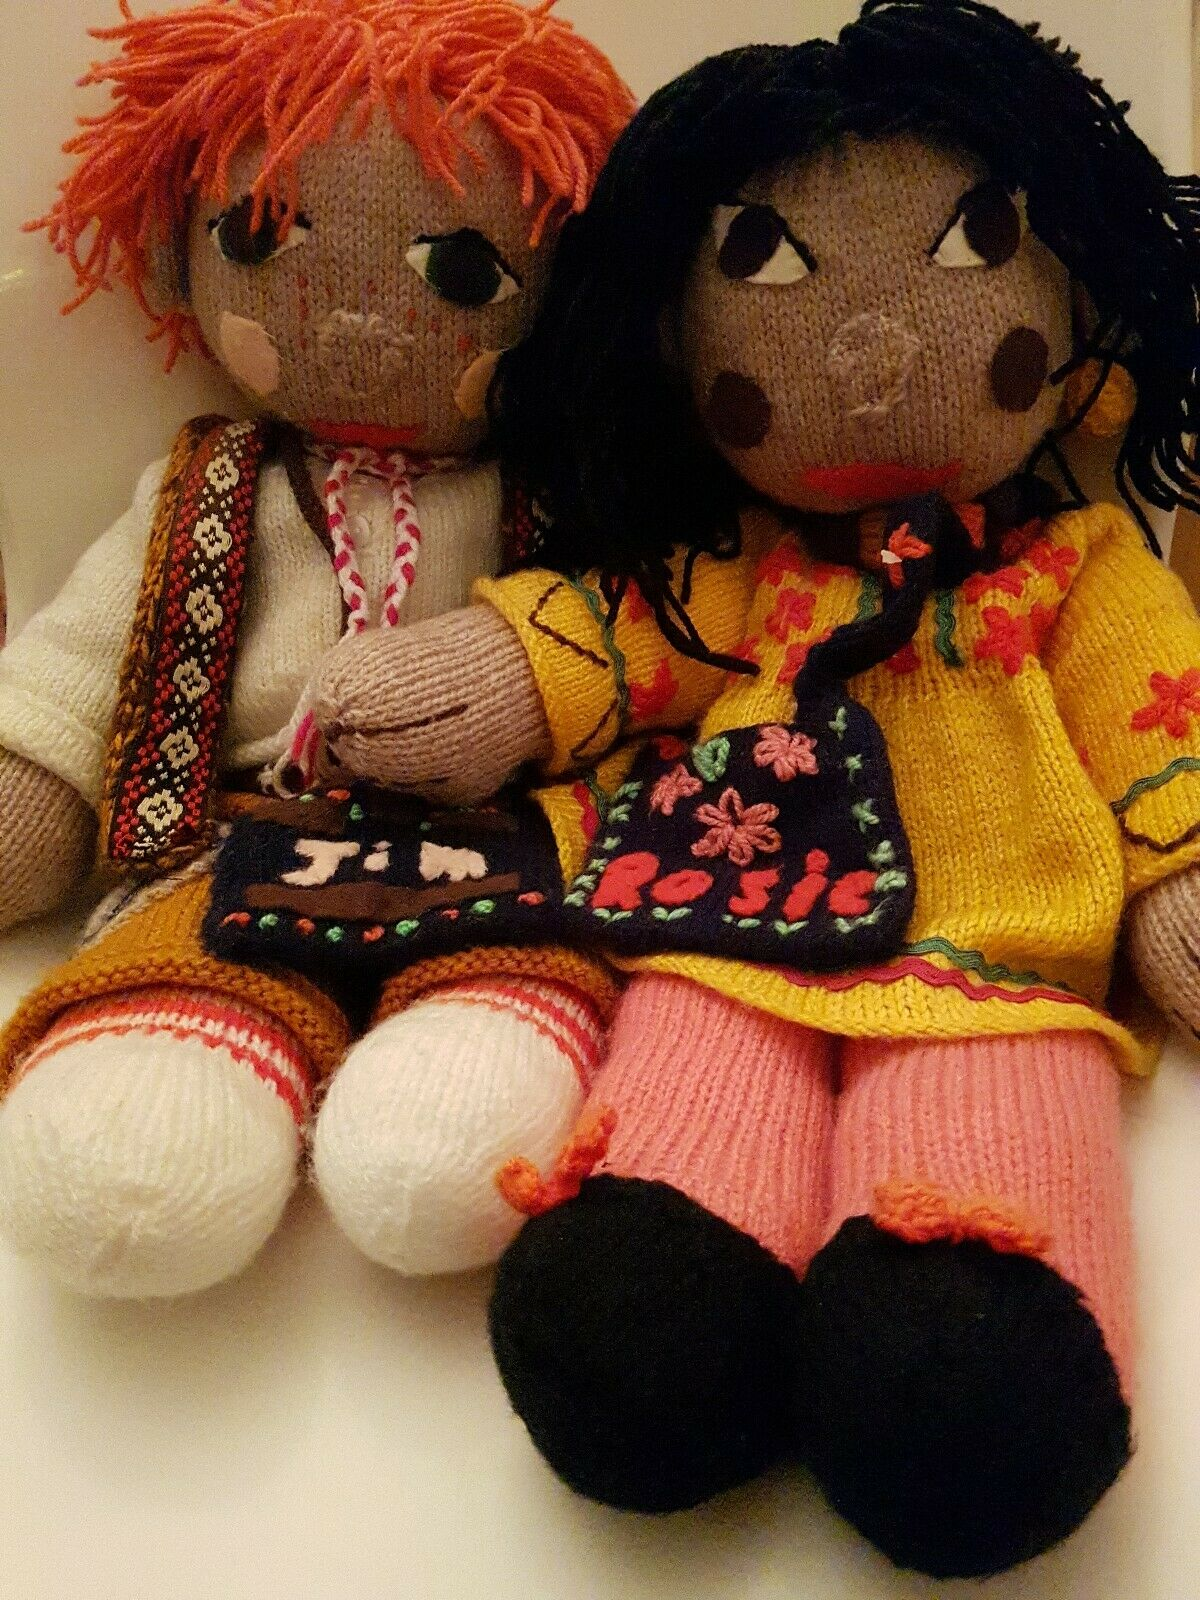 Rosie And Jim Large Jahr Knitted Rag Dolls 20